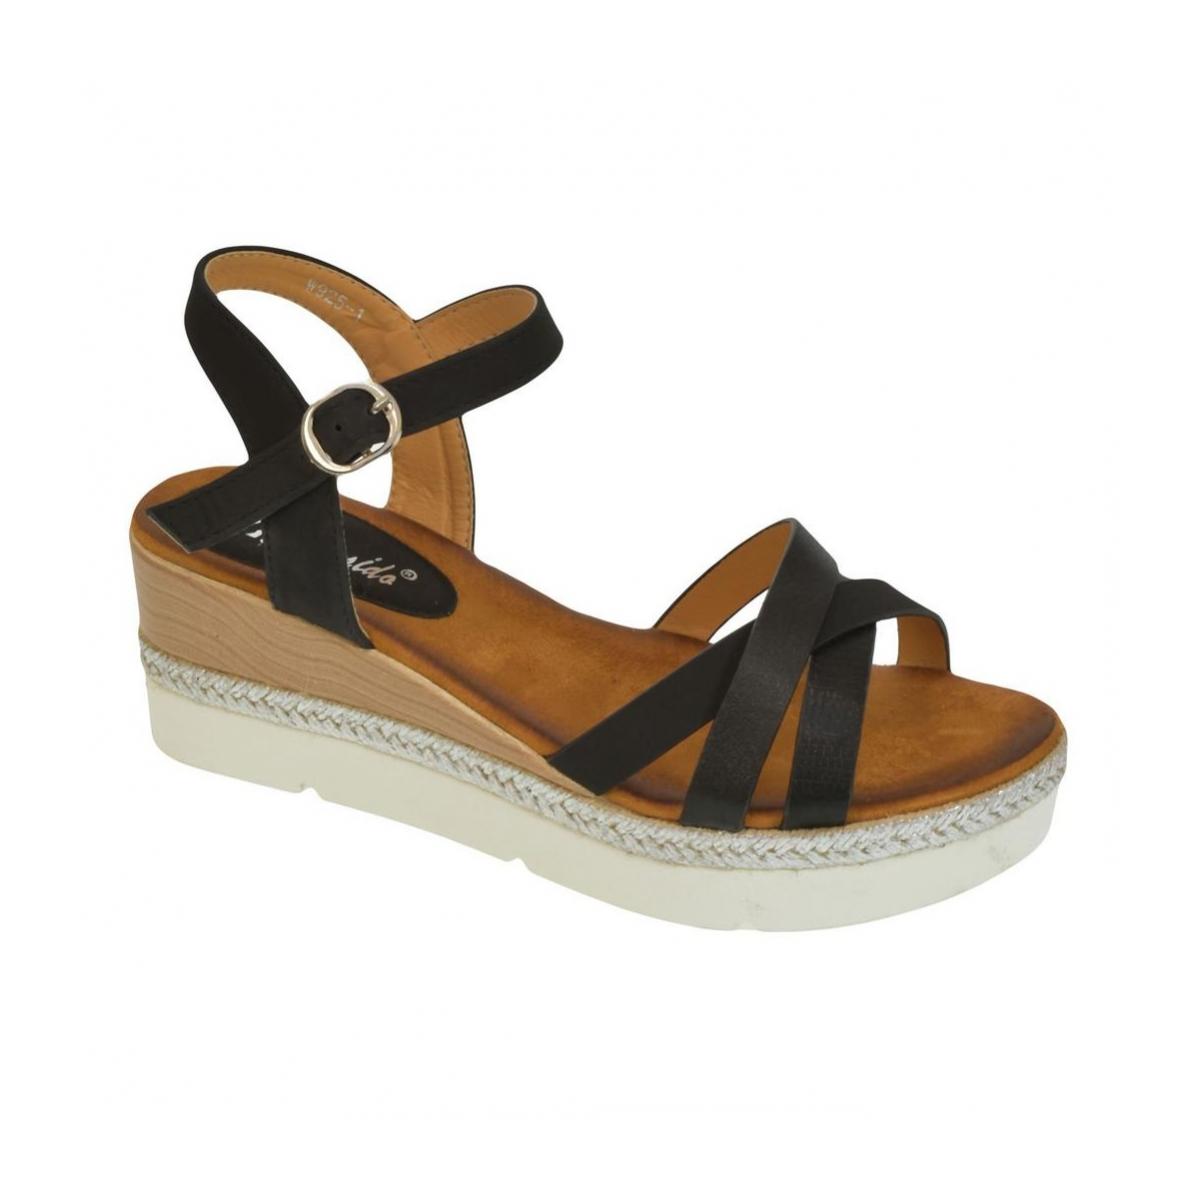 d870b8ddb5ee Dámske čierne sandále RILLA - 4